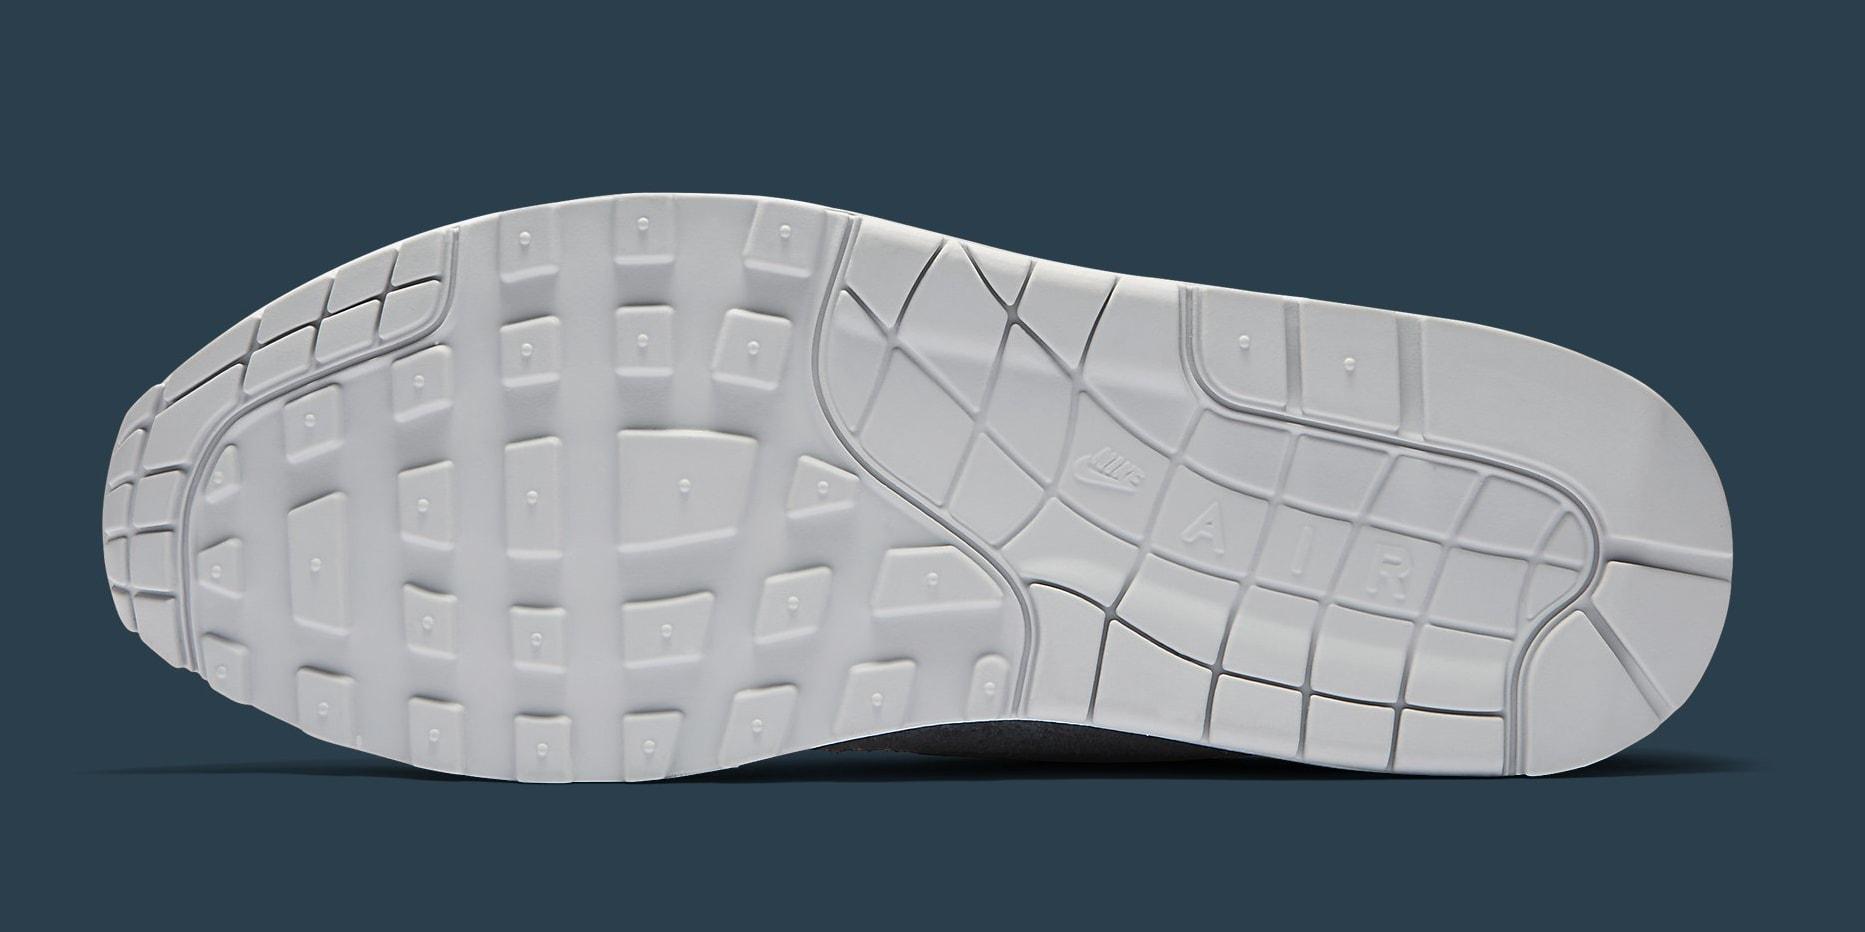 Nike Air Max 1 'City Pack' London CV1639-001 Outsole